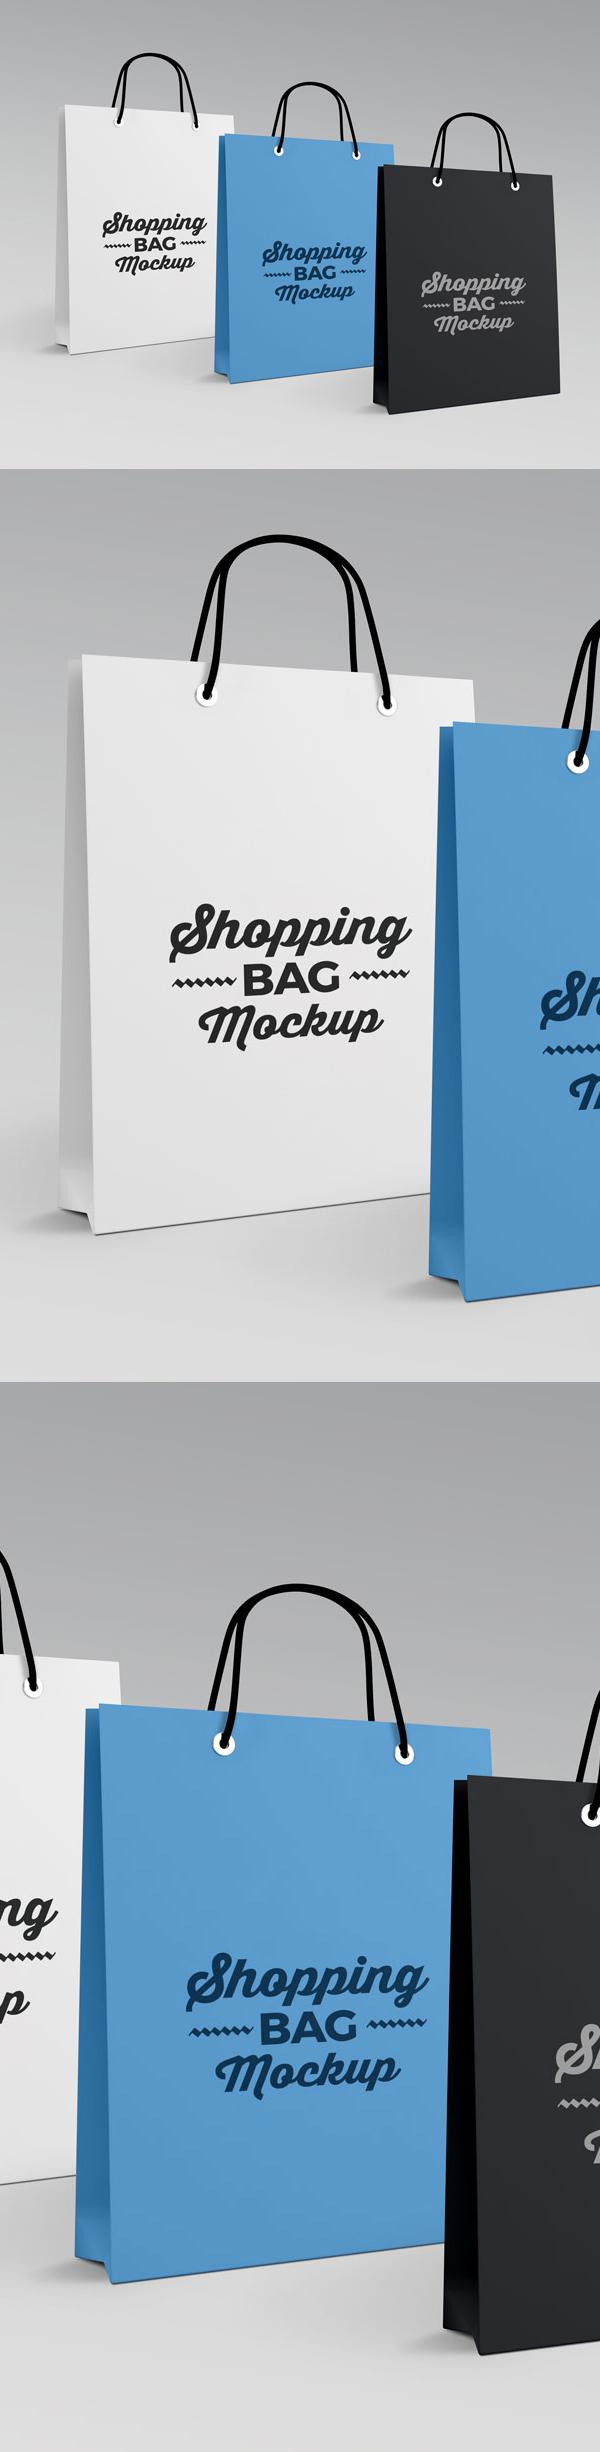 Download Free Download Paper Bag Mockup Psd Freebies Bag Mockup Luxury Paper Bag Mockup Free Psd Download